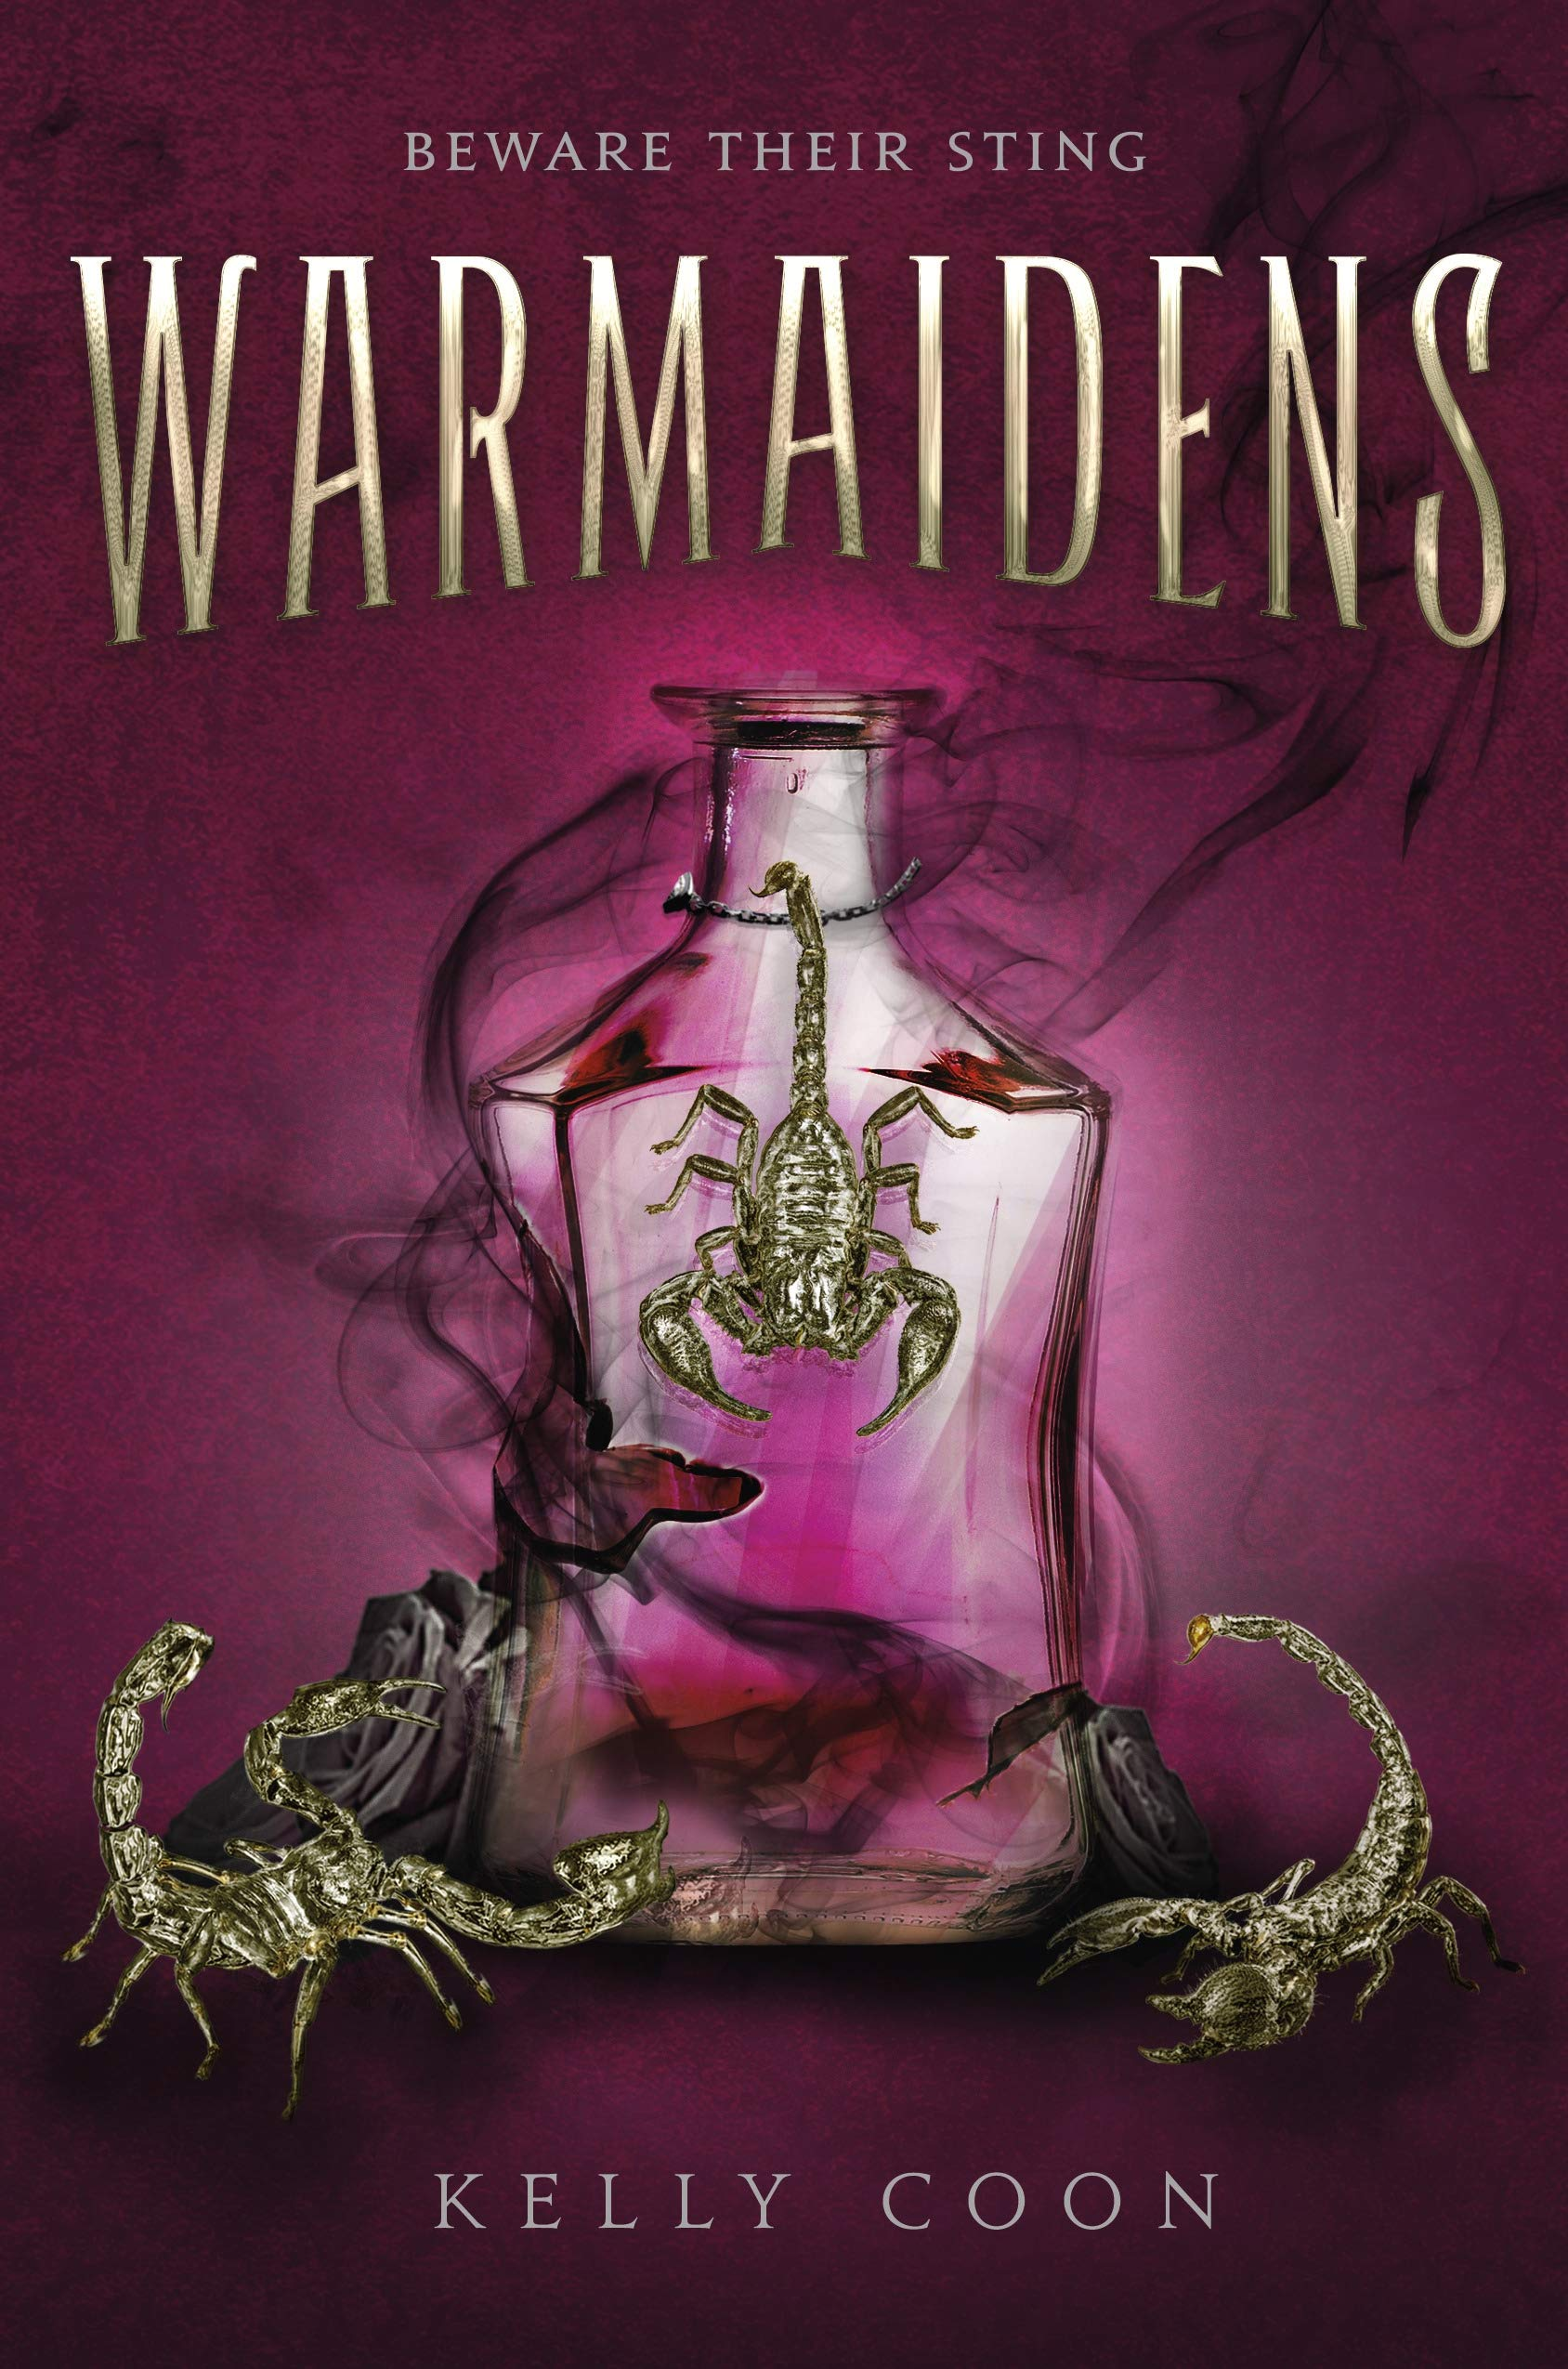 Amazon.com: Warmaidens (9780525647867): Coon, Kelly: Books